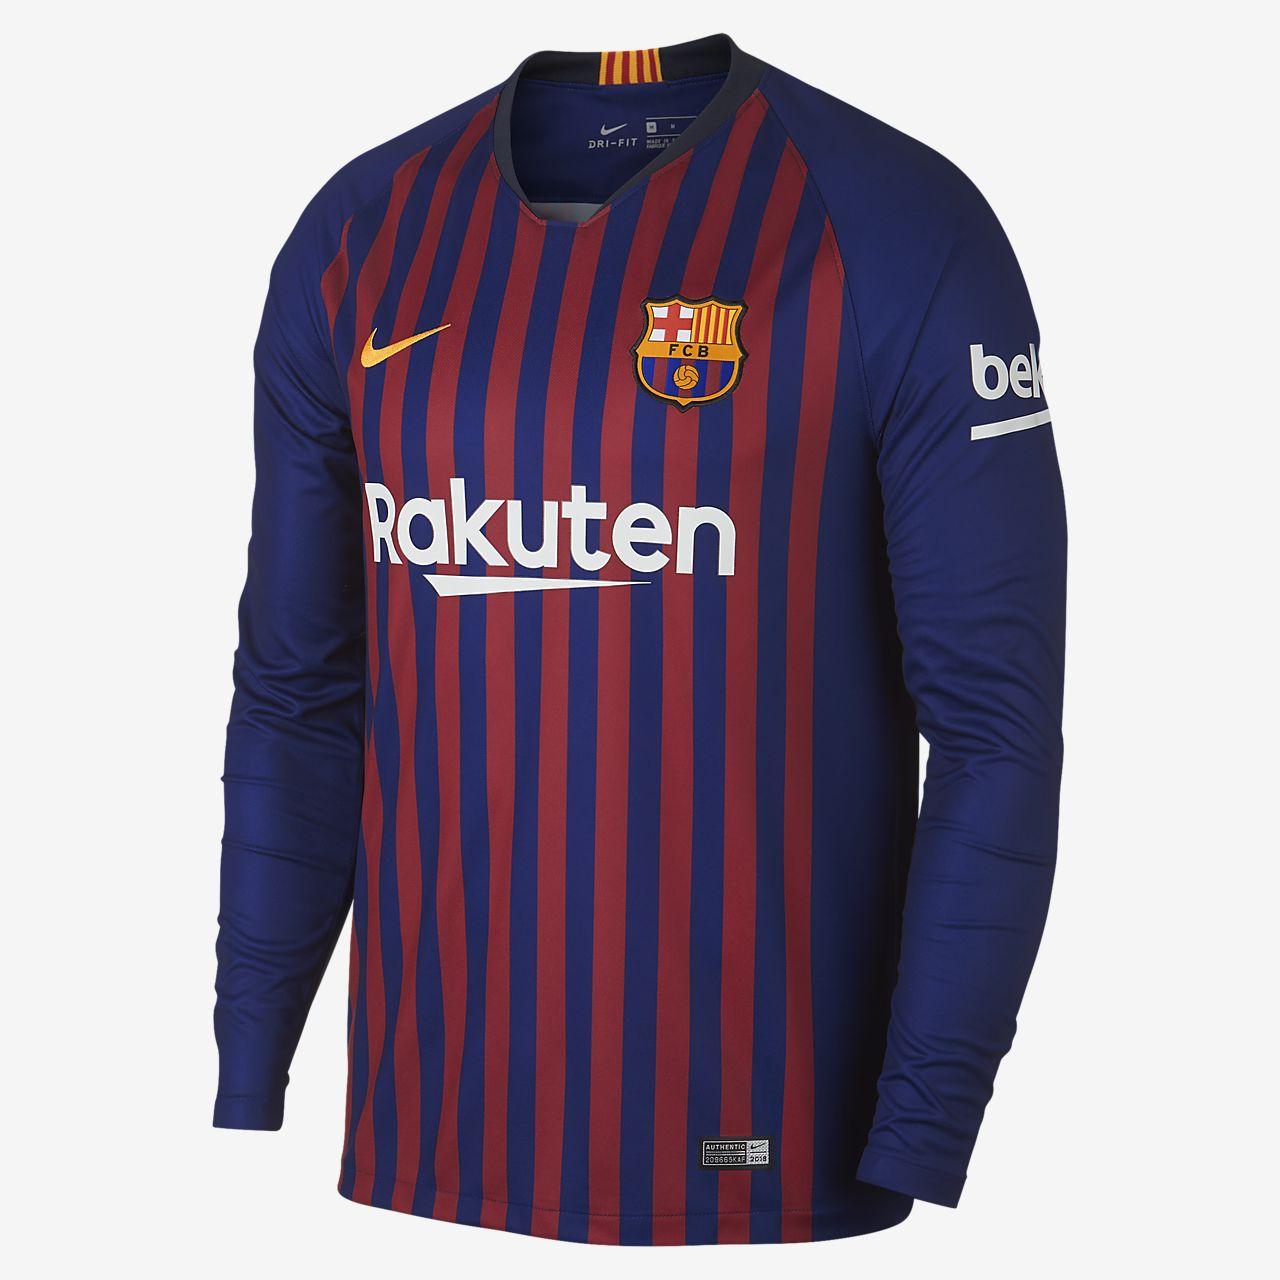 fa77aa925 ... Męska koszulka piłkarska z długim rękawem 2018/19 FC Barcelona Stadium  Home